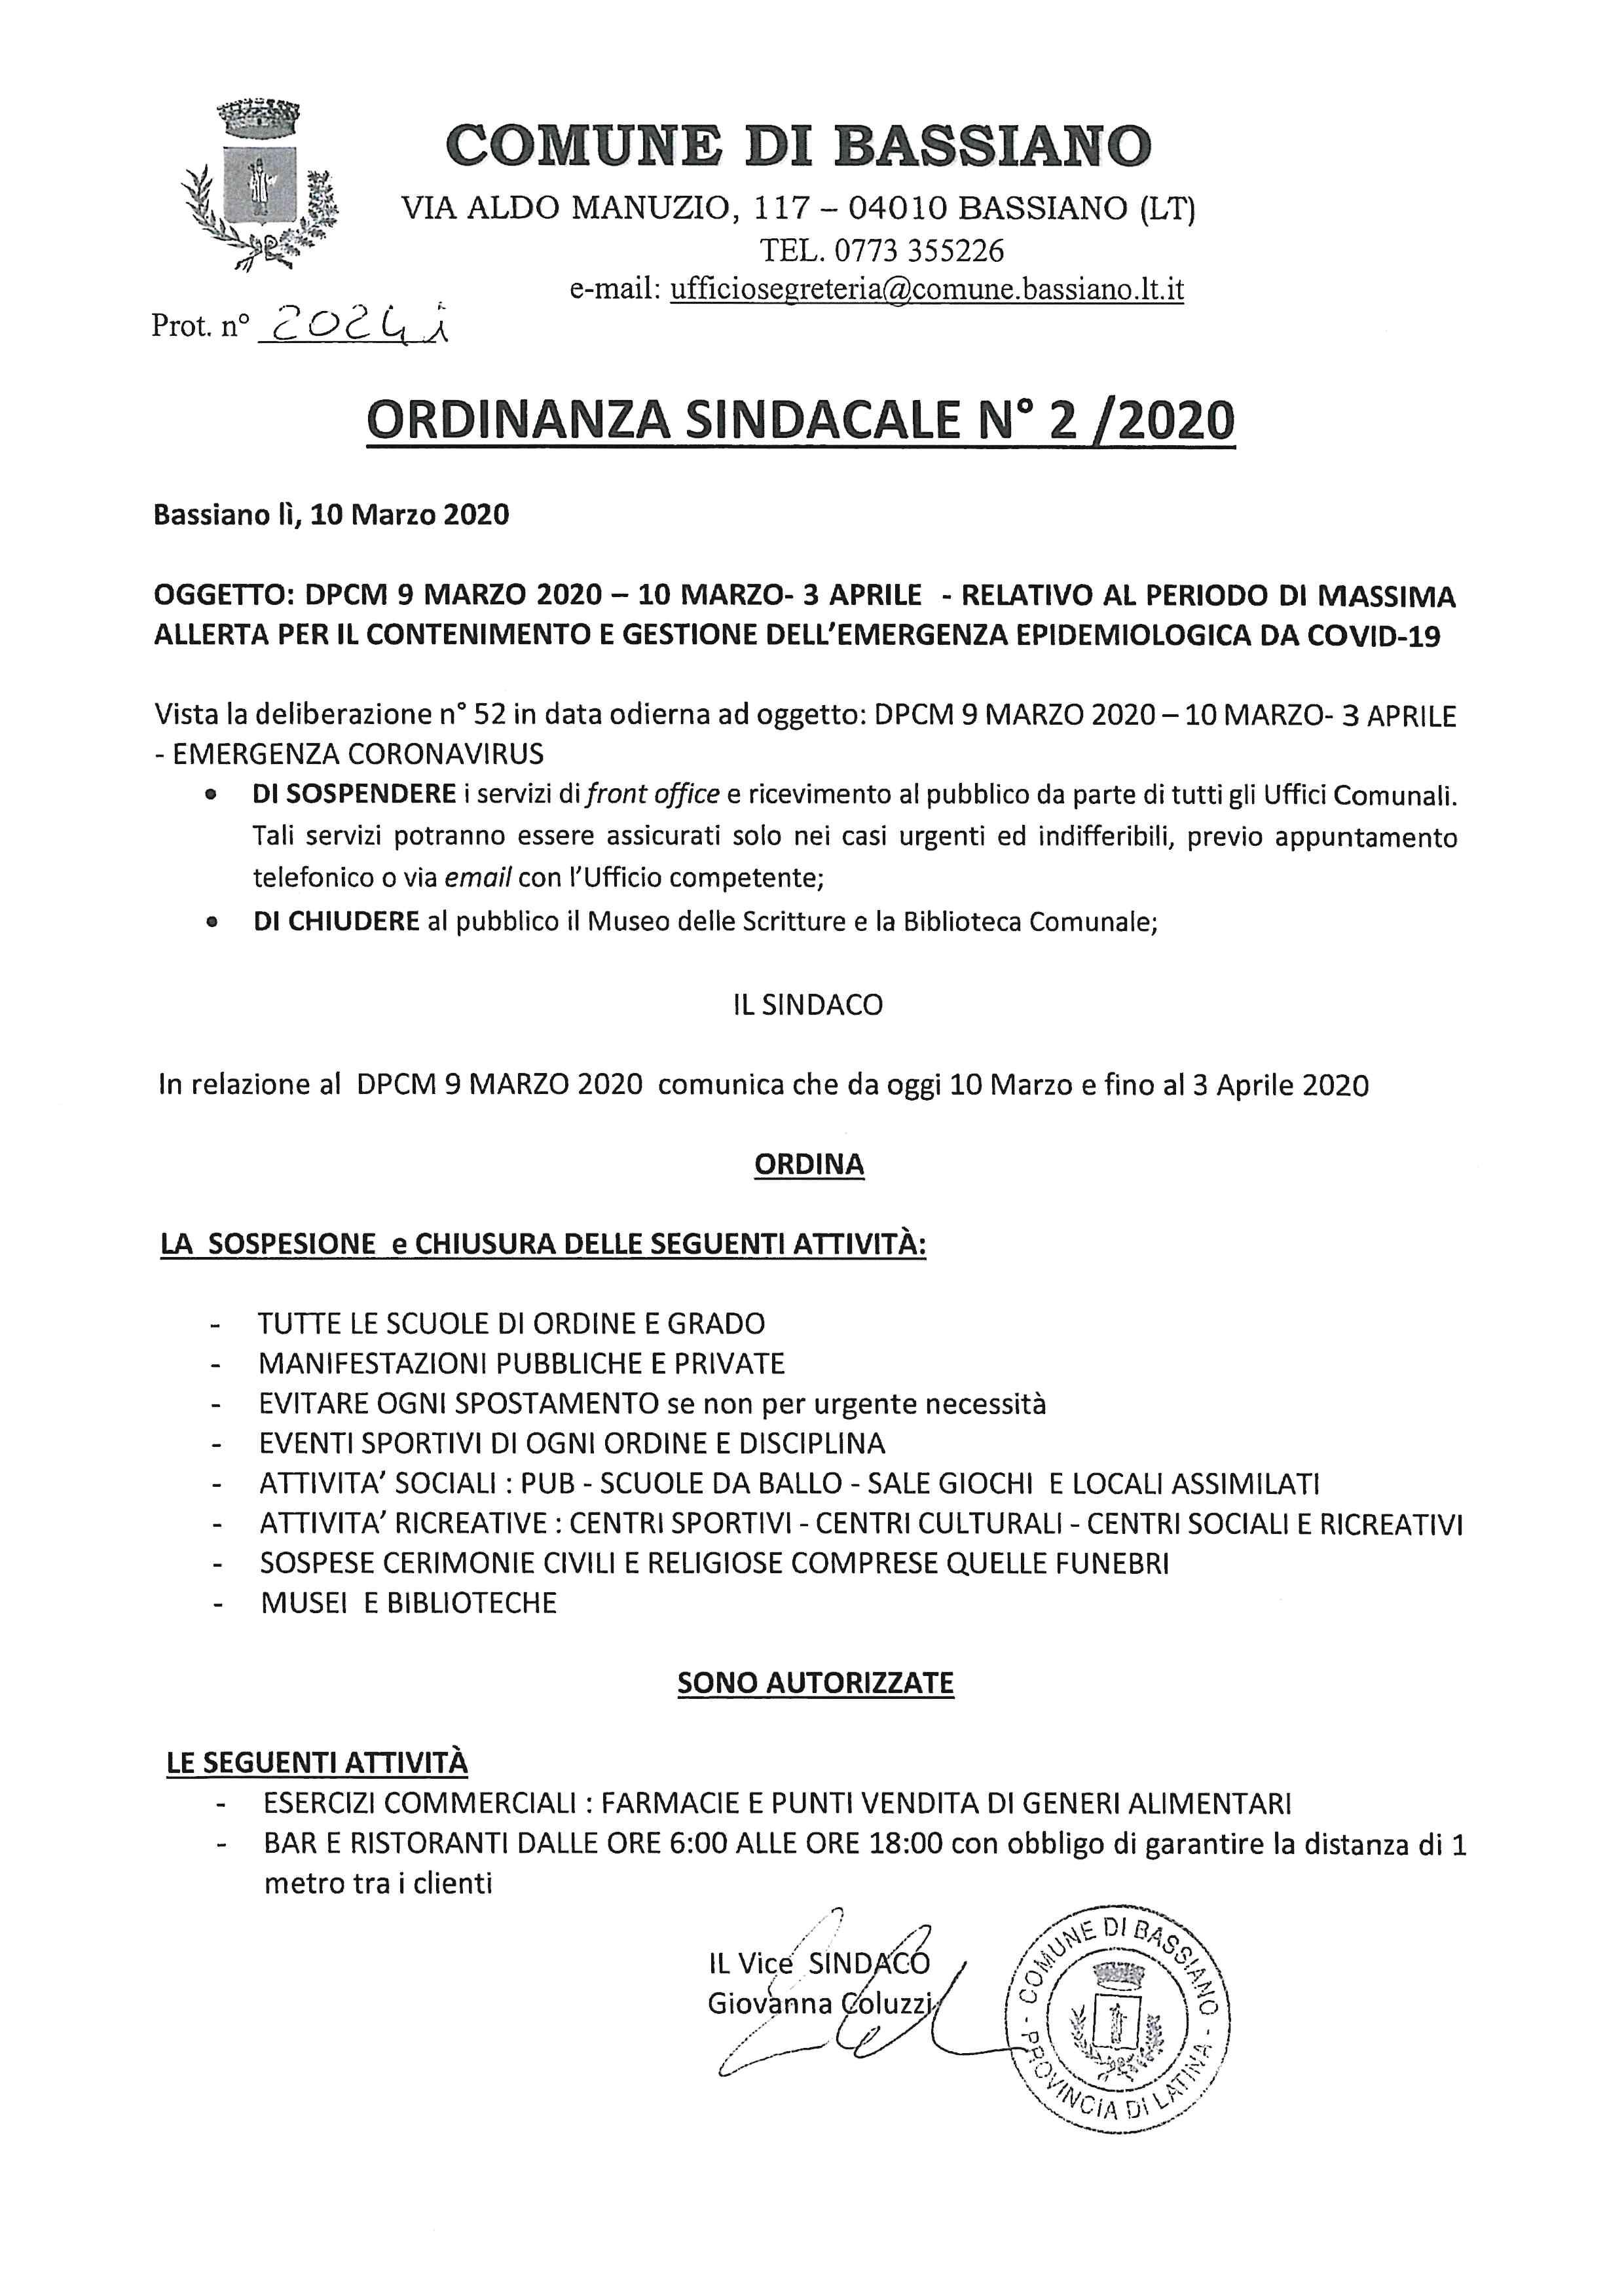 ORDINANZA SINDACALE N. 2/2020